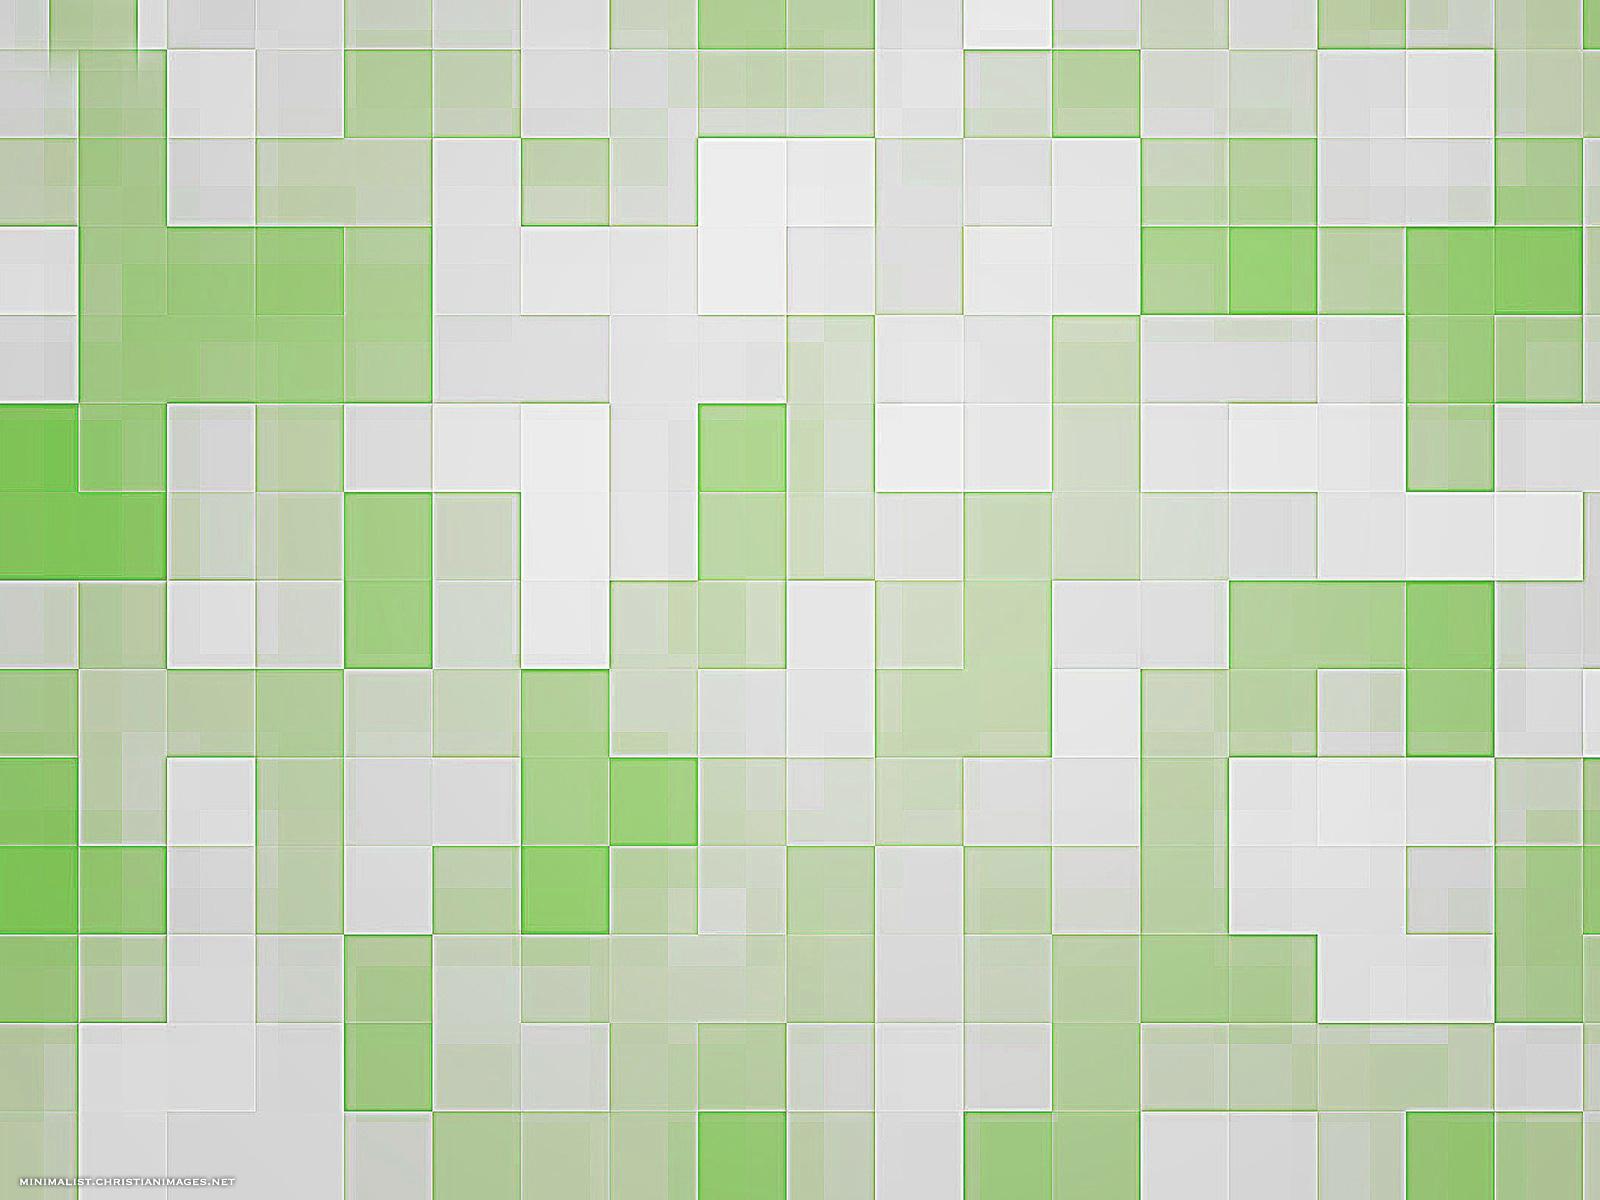 Green Mosaic Background - Minimalist Backgrounds